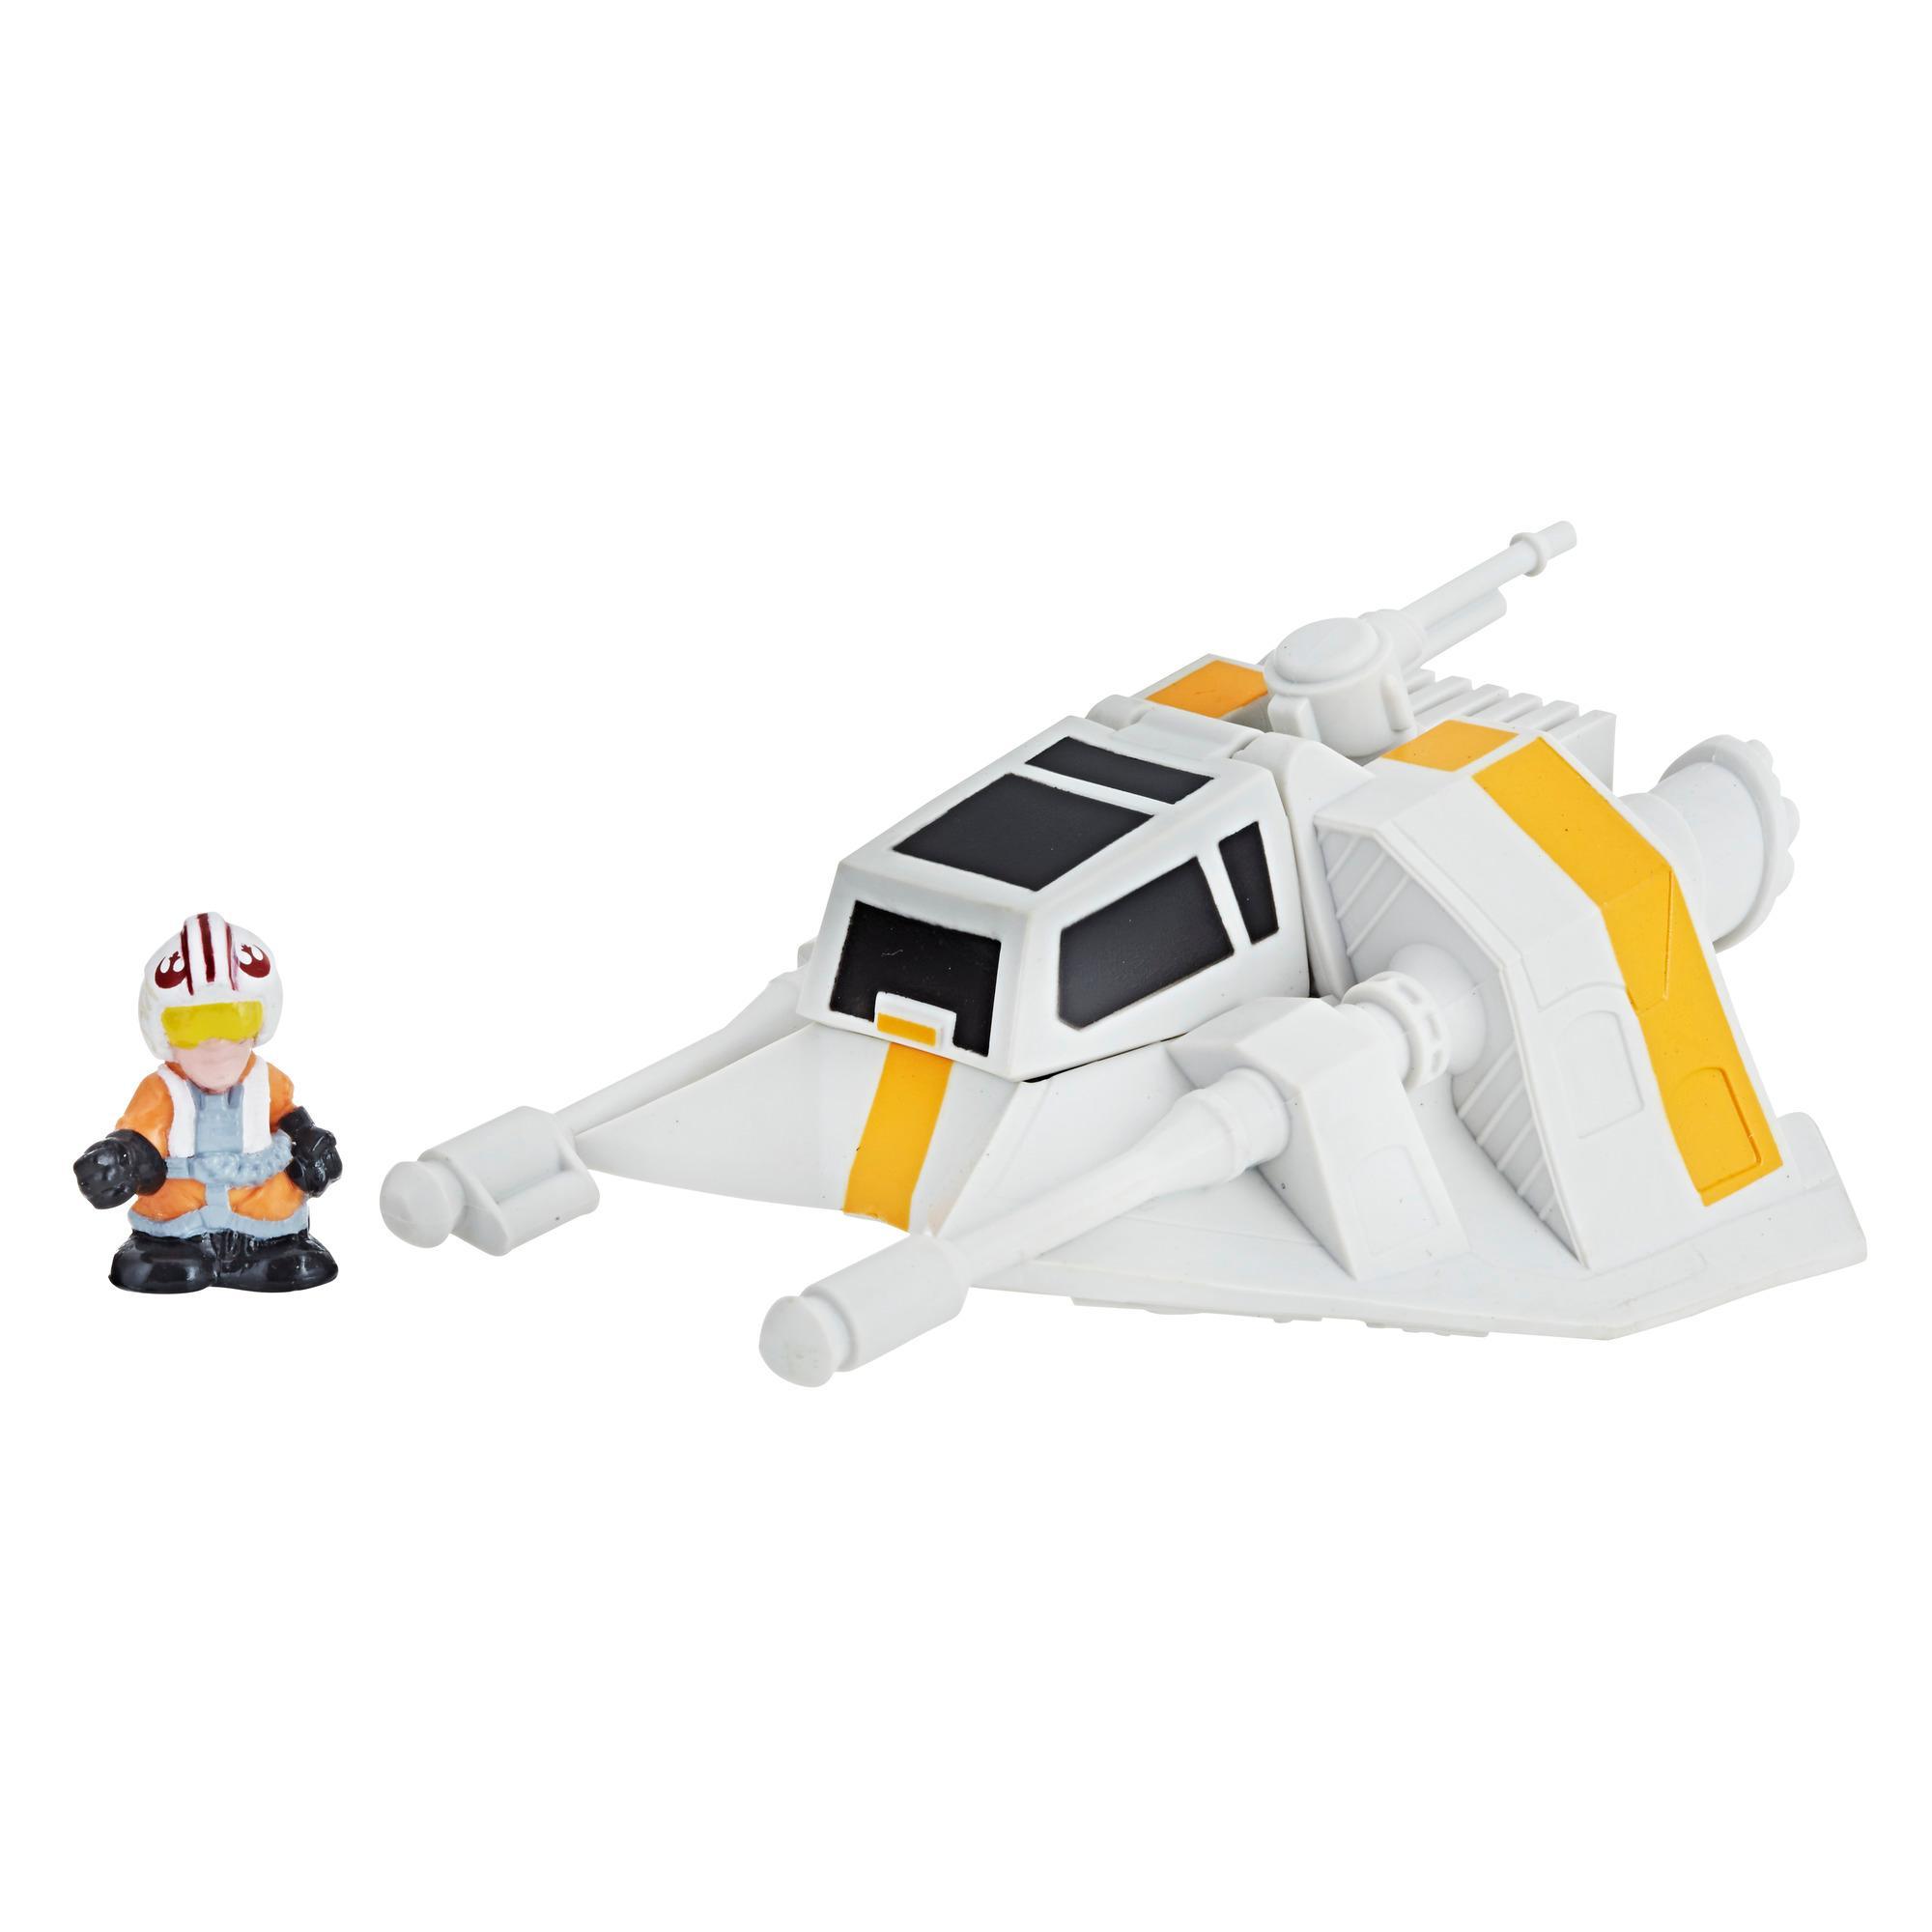 Star Wars Micro Force Snowspeeder & Luke Skywalker